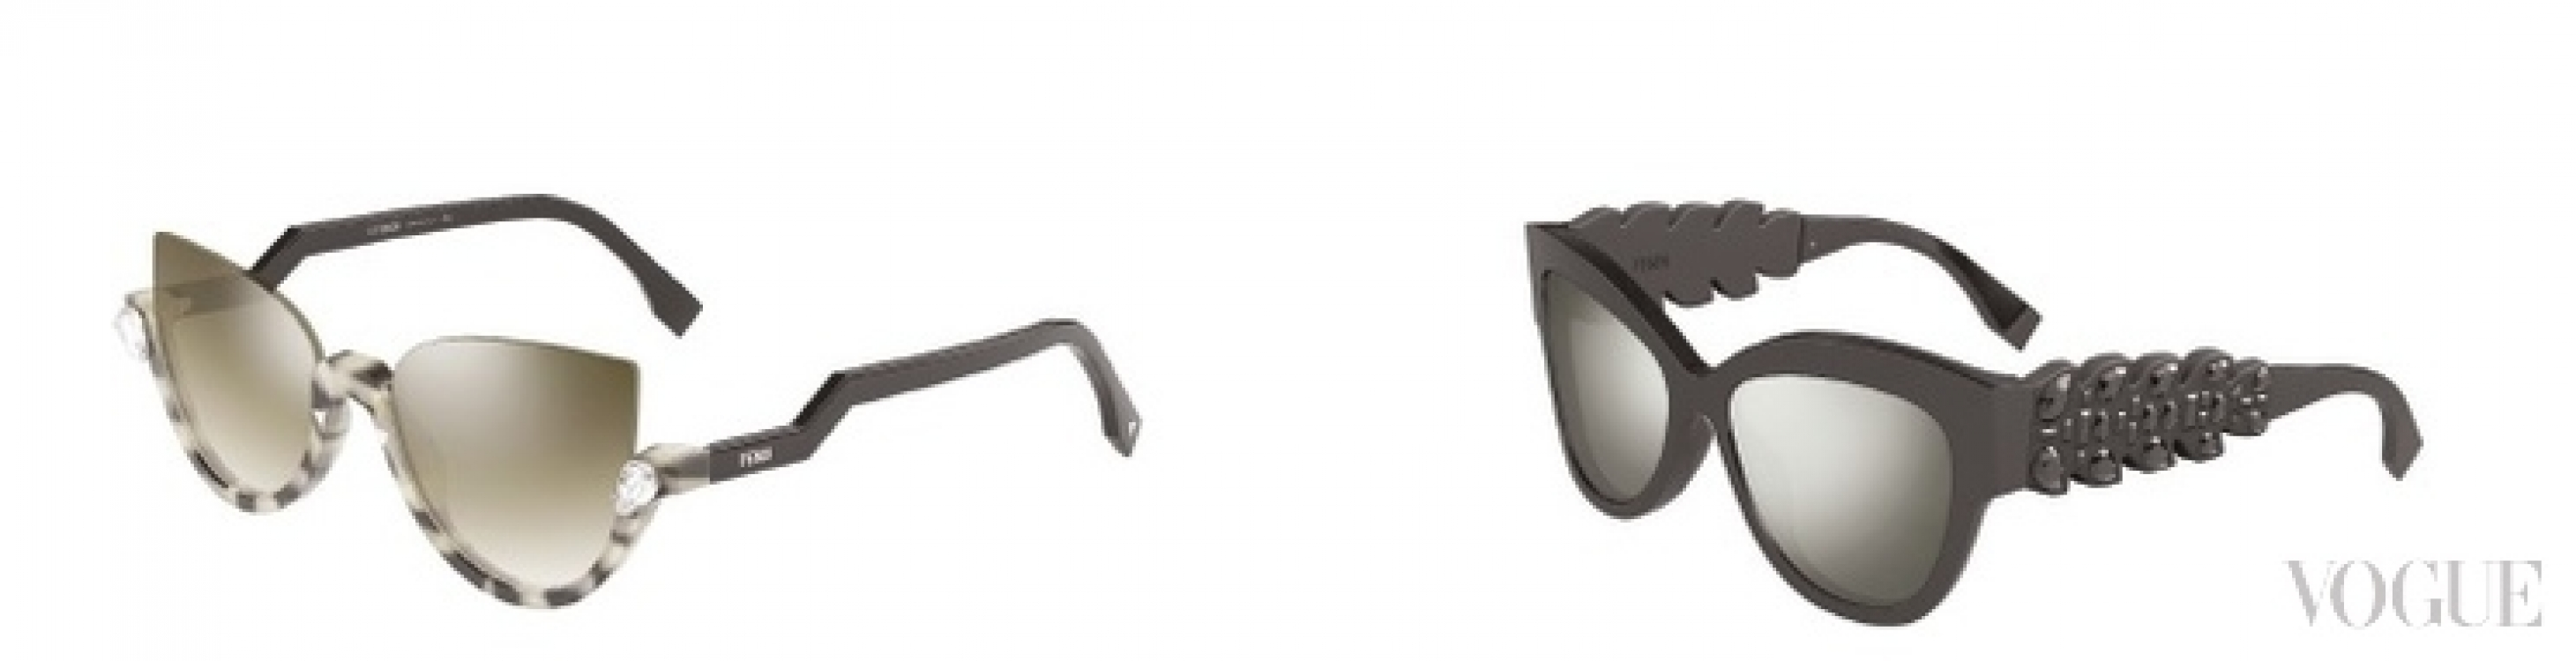 Fendi Blink / Fendi Croco Tail